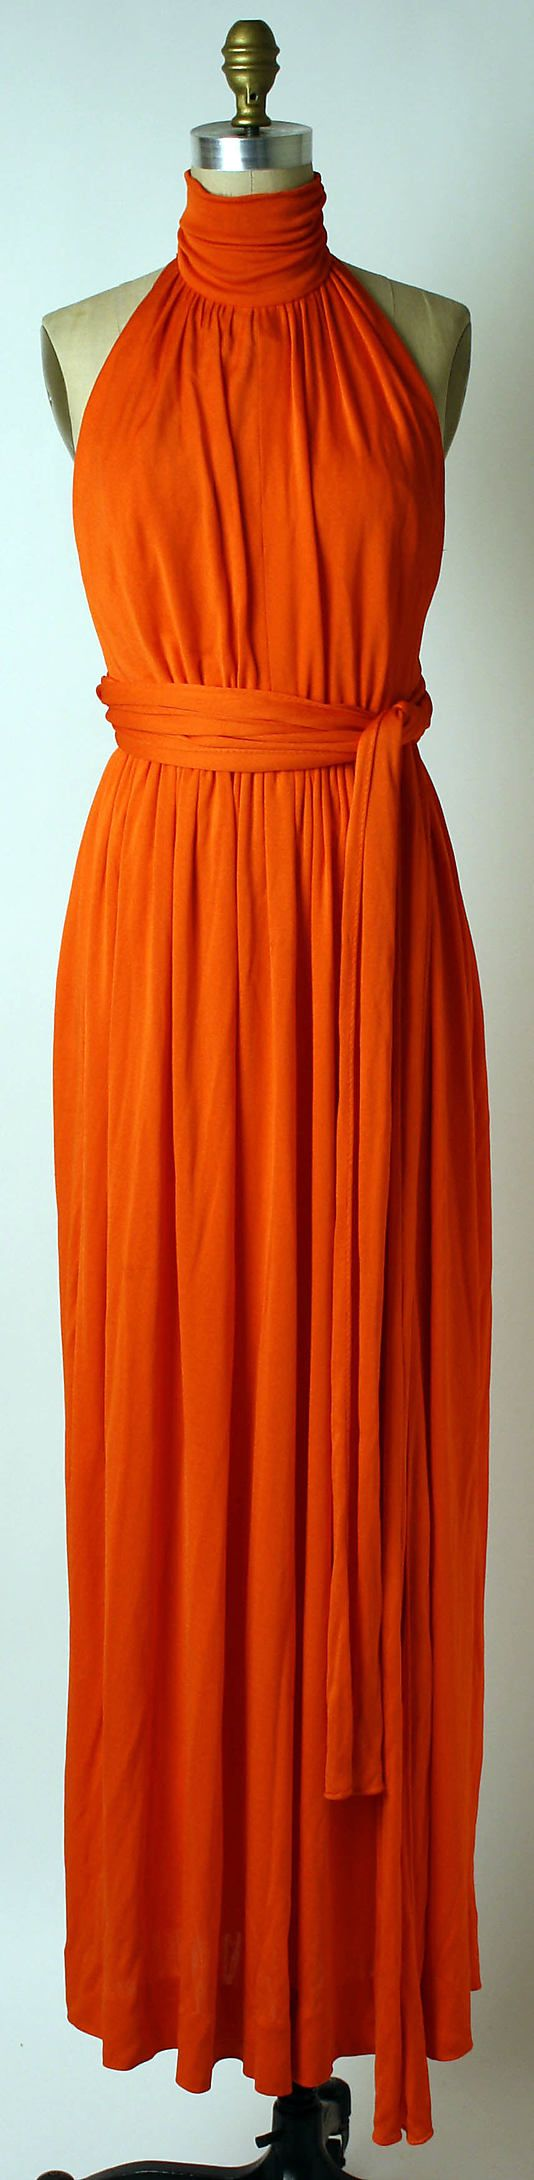 Evening dress Donald Brooks (American, 1928–2005) Date: ca. 1972 Culture: American Medium: synthetics